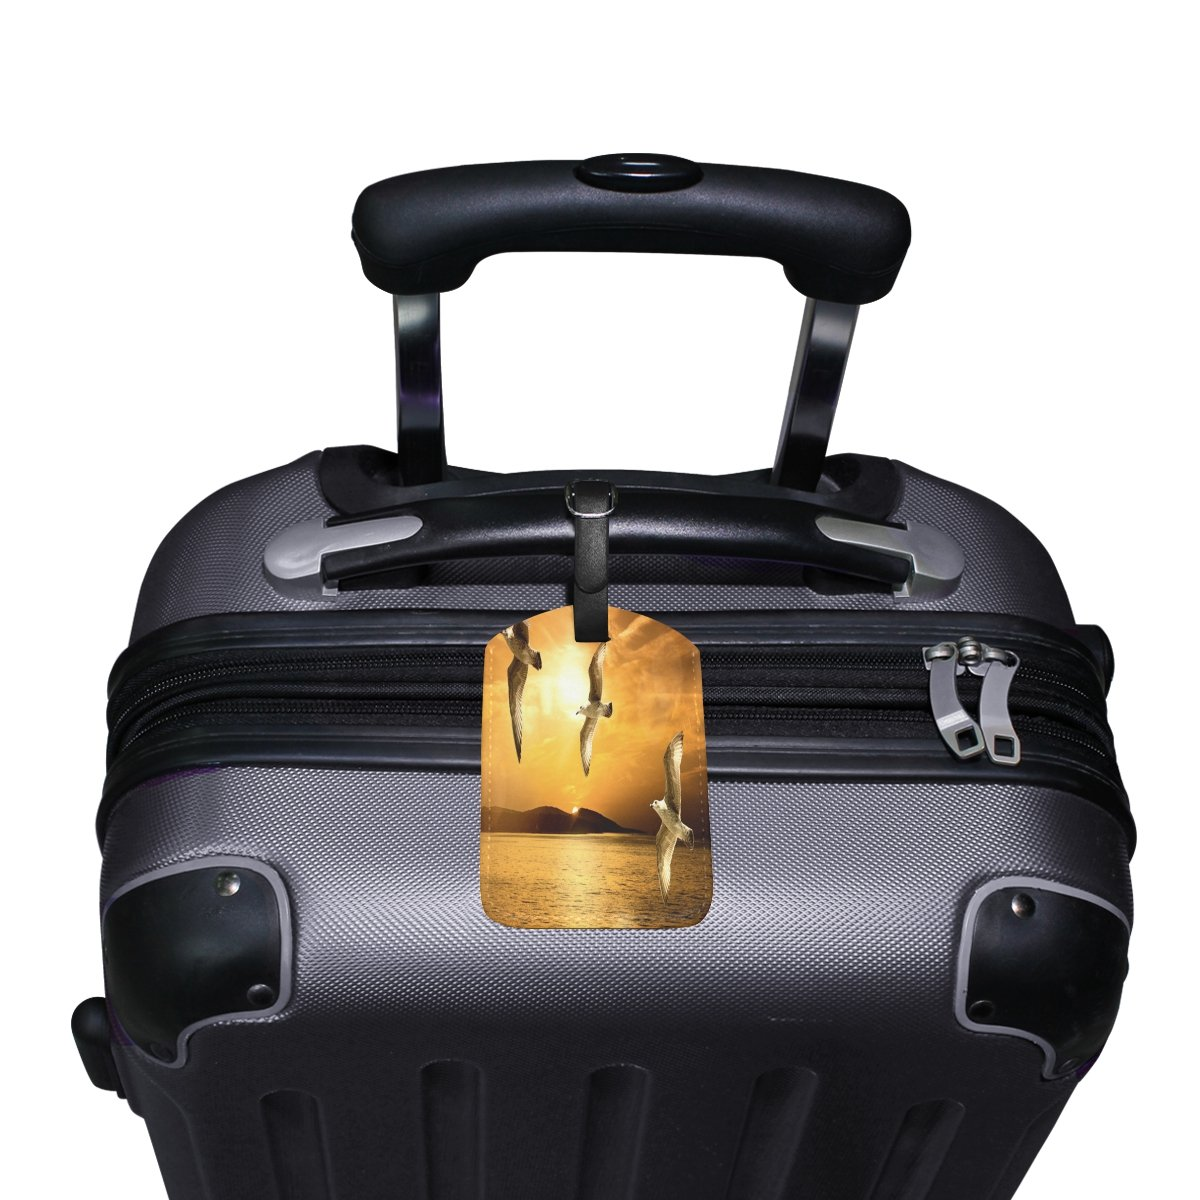 1Pcs Saobao Travel Luggage Tag Flying Seagulls PU Leather Baggage Suitcase Travel ID Bag Tag